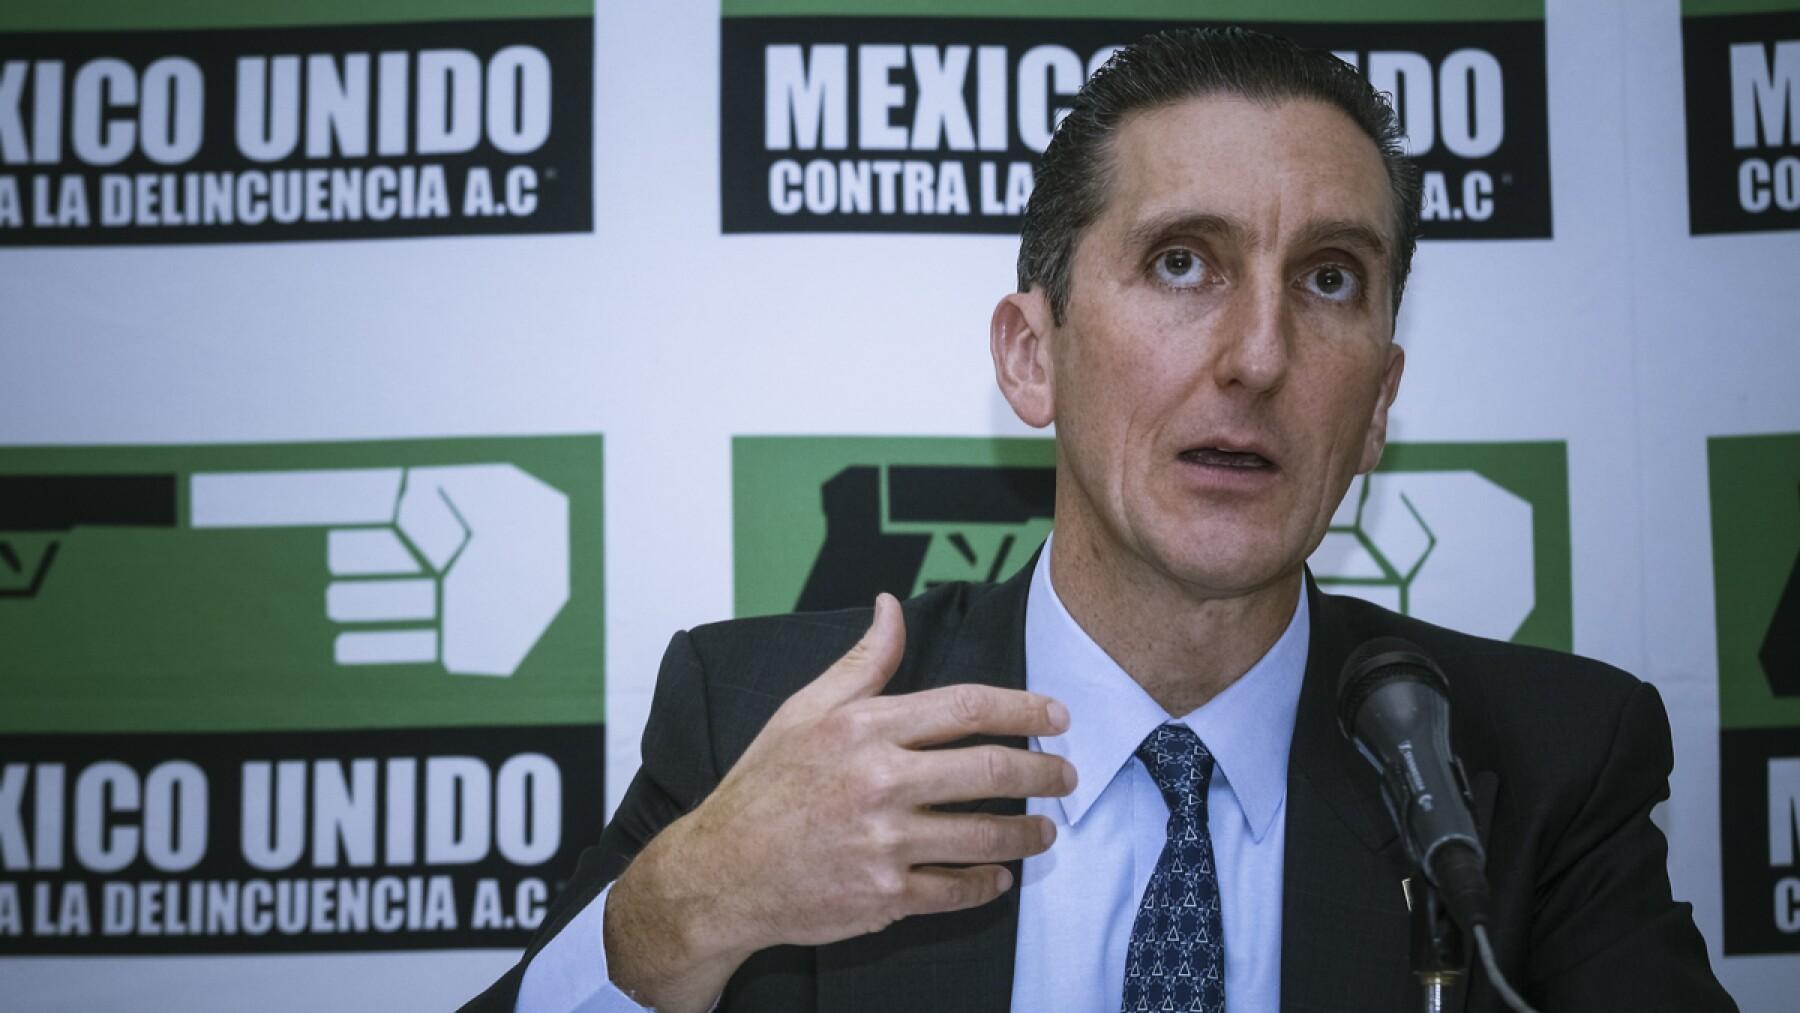 Juan Francisco Torres Landa